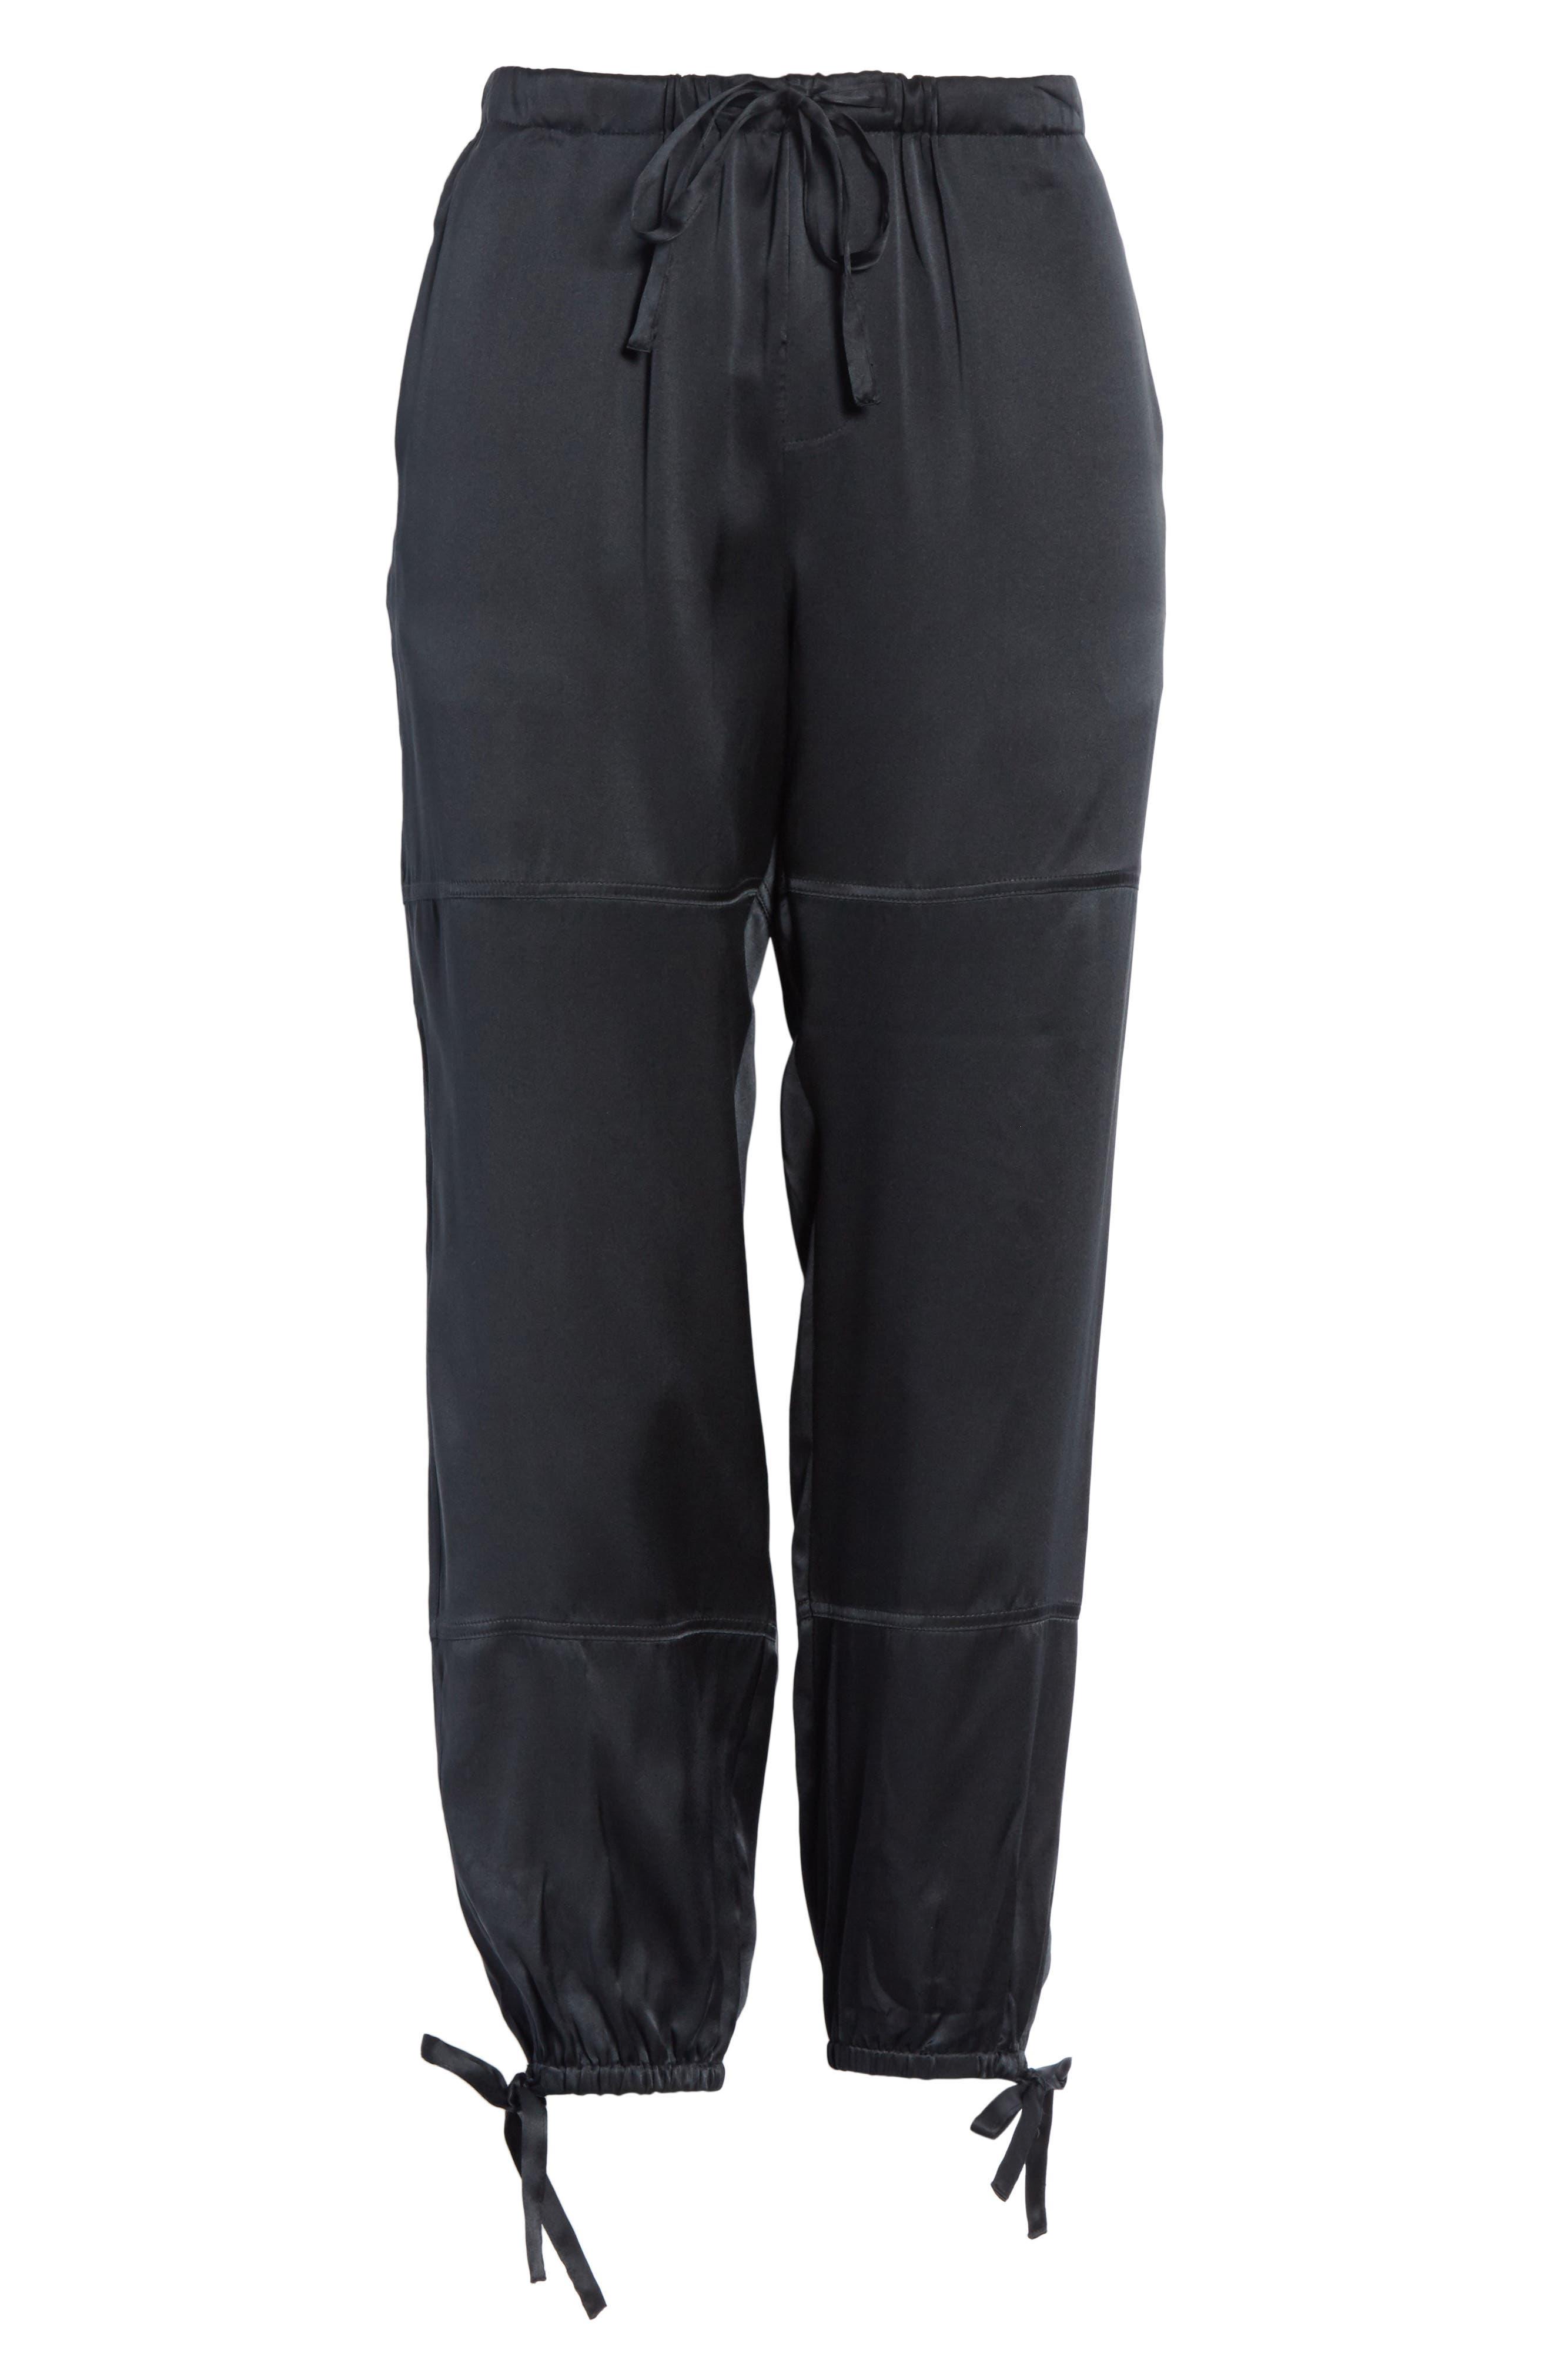 Dyre D Silk Jogger Pants,                             Alternate thumbnail 6, color,                             002